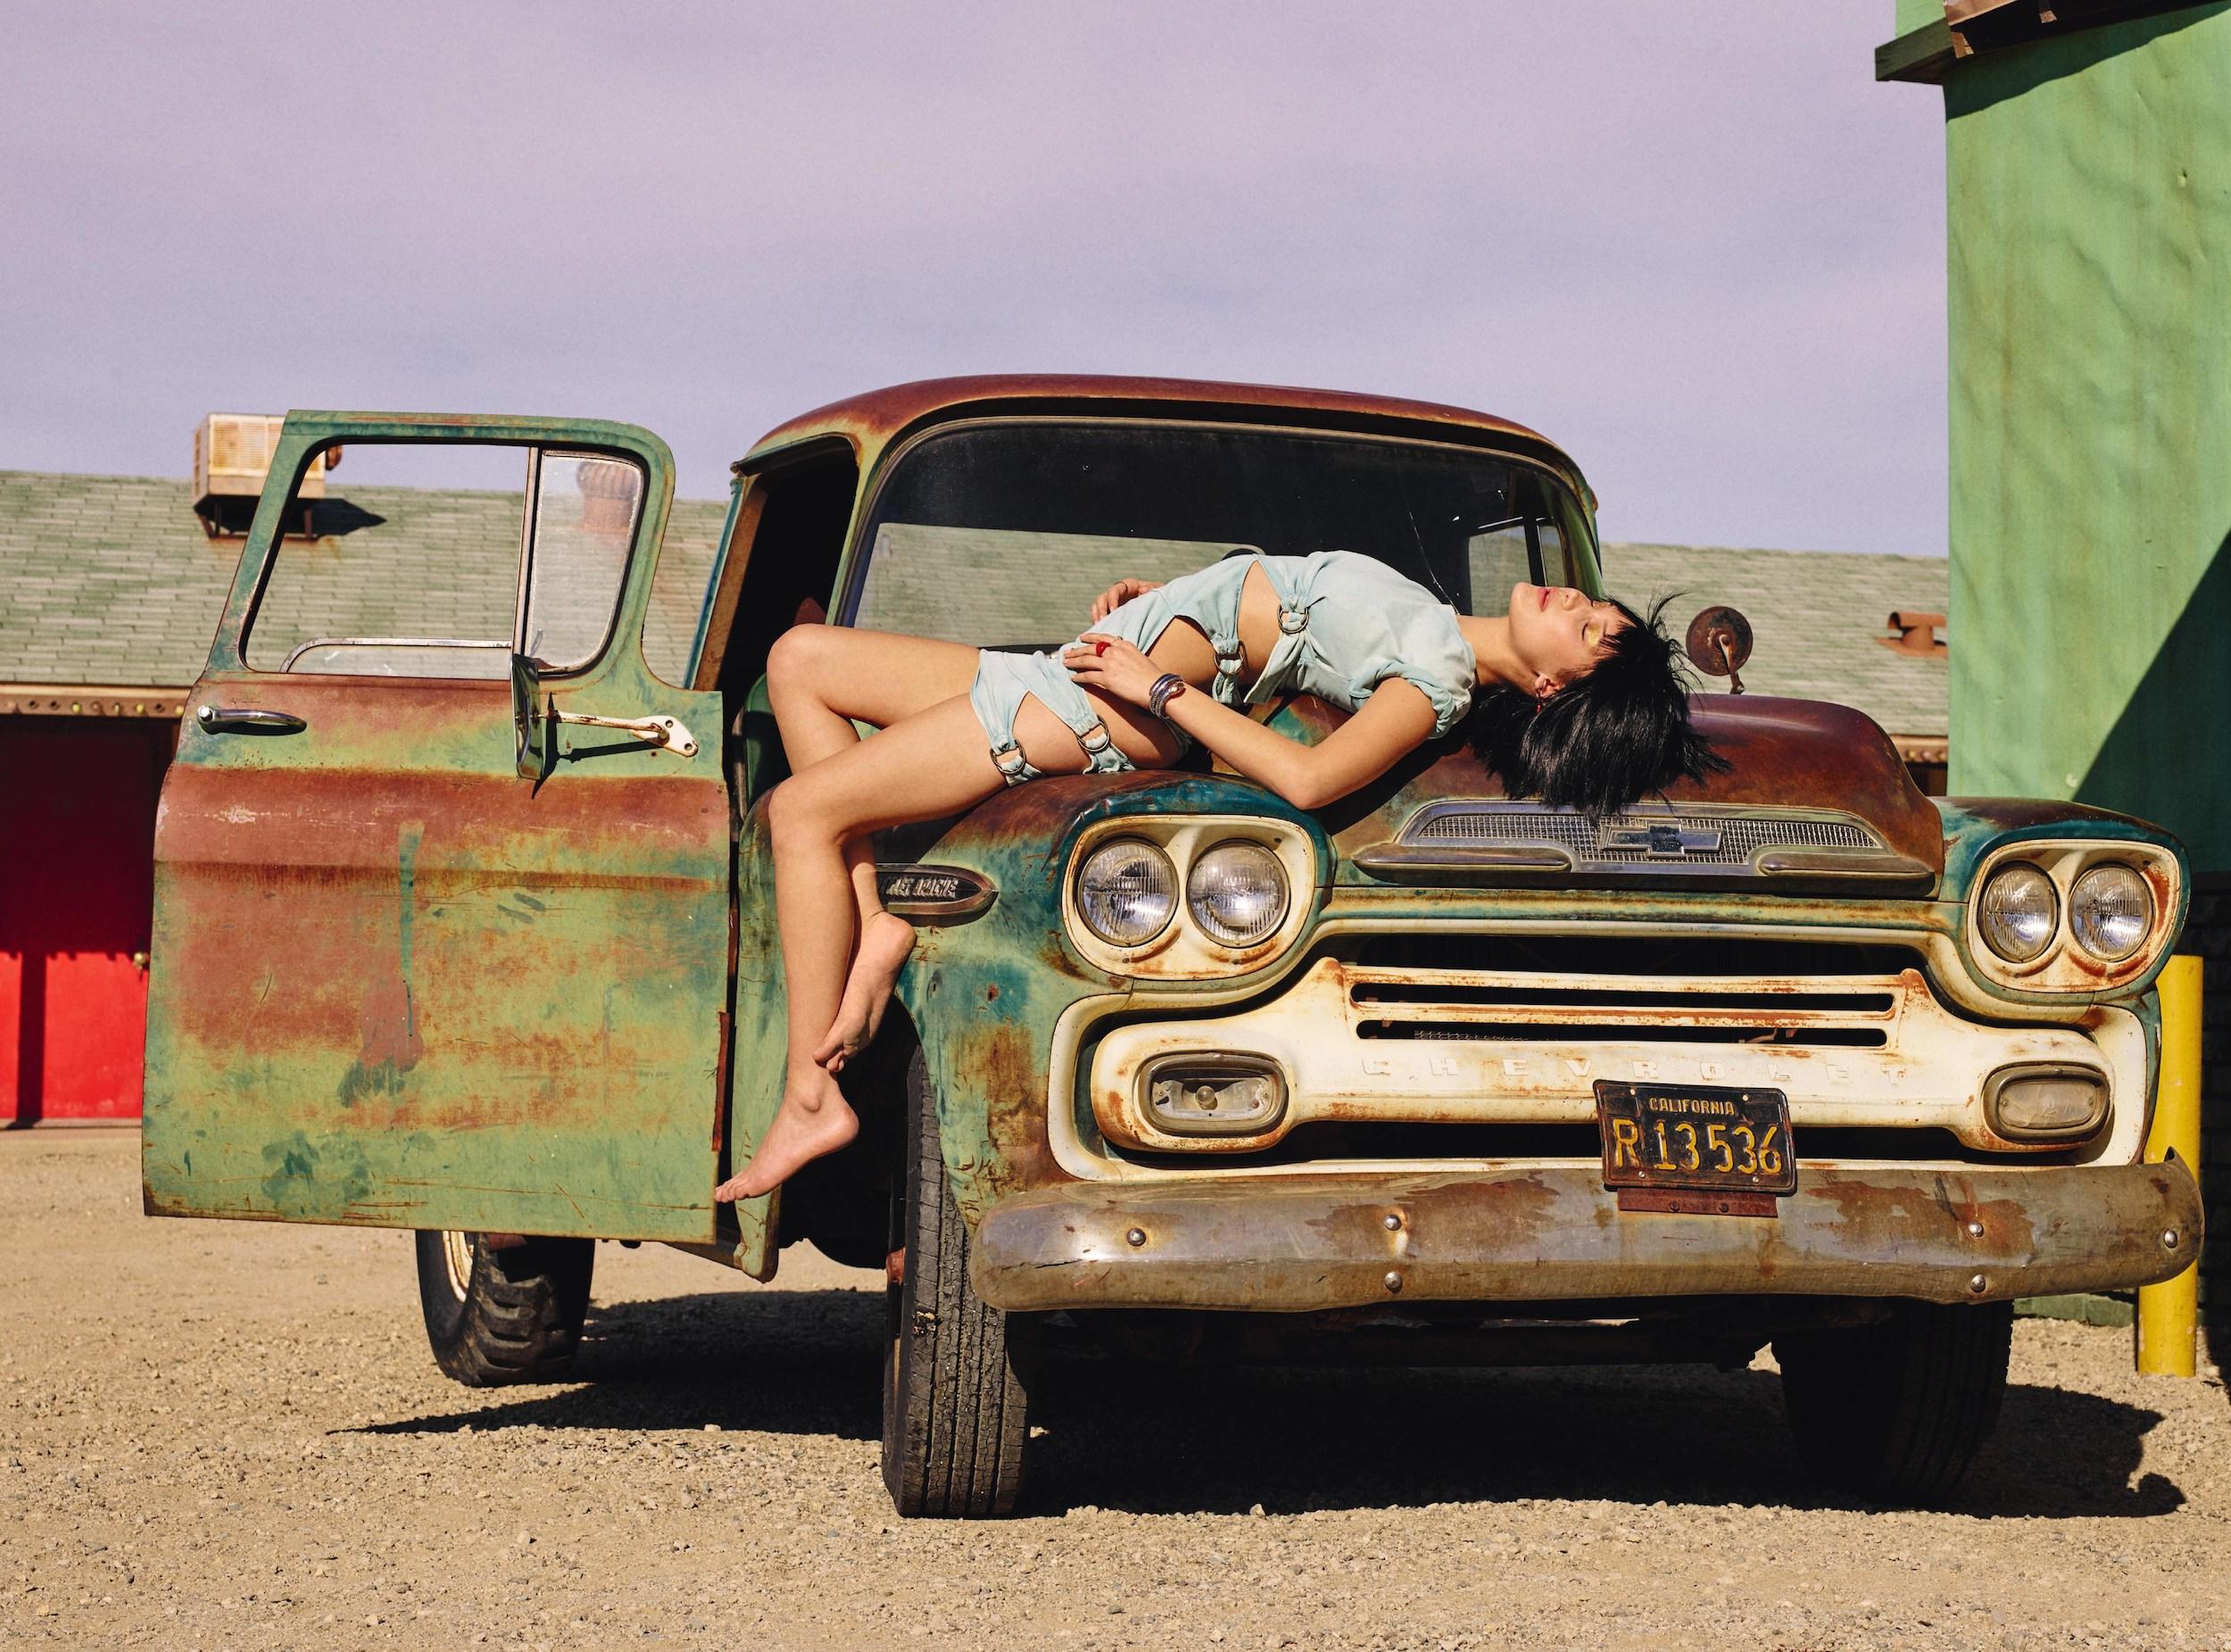 bella-hadid-by-sam-taylor-johnson-for-love-magazine-spring-summer-2016-3.jpg